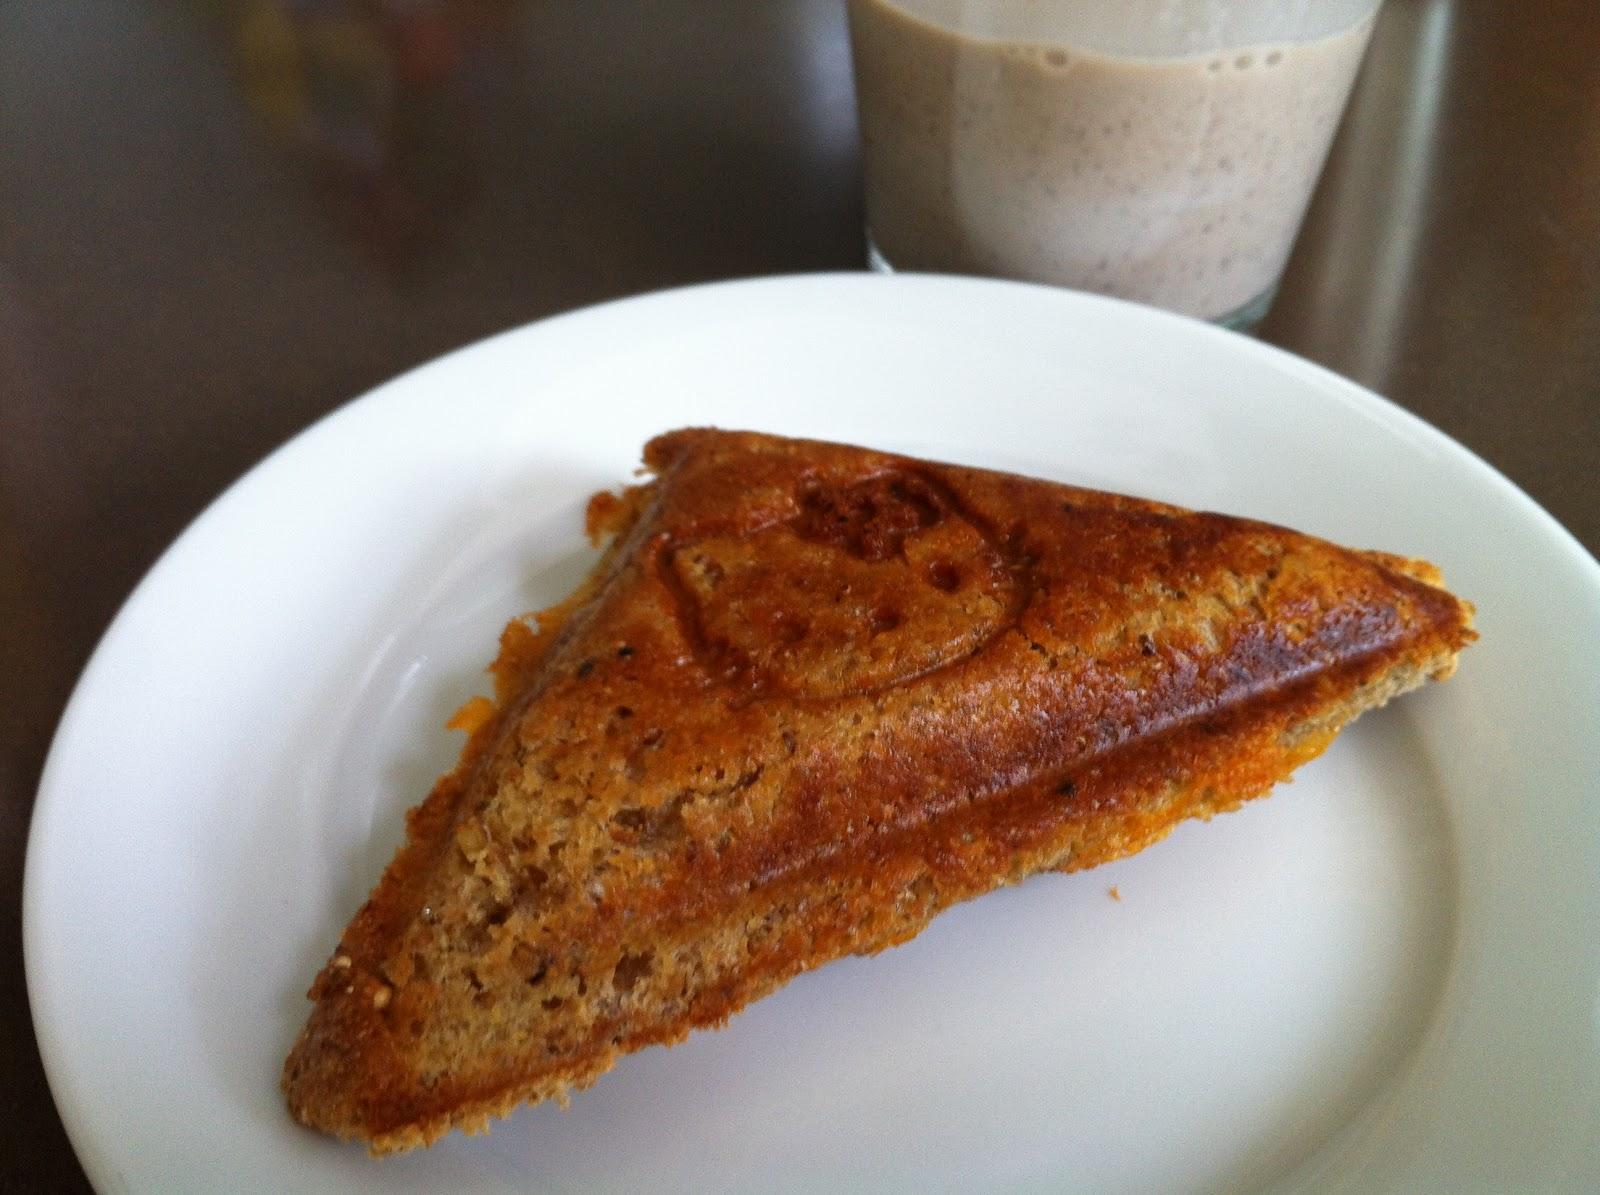 grilled cheese sandwich & chocolate milk | KetoCook